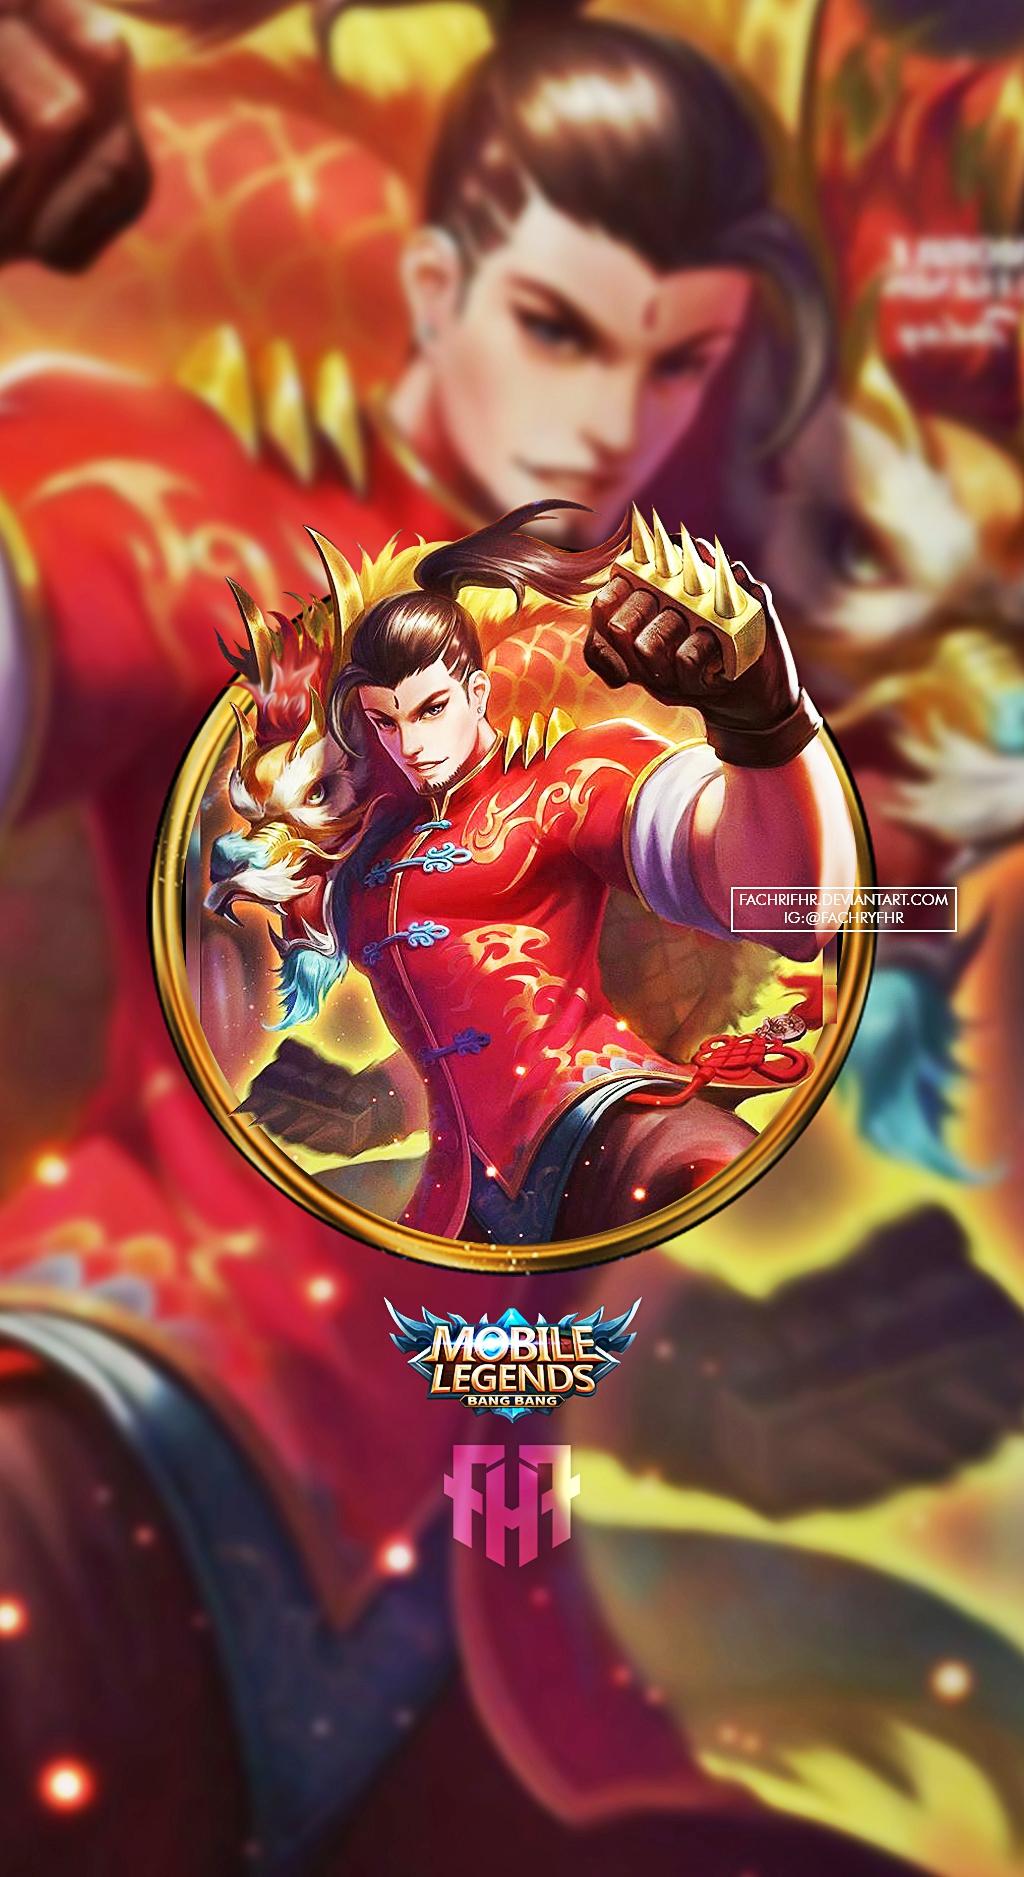 Wallpaper Phone Chou Dragon Boy by FachriFHR on DeviantArt